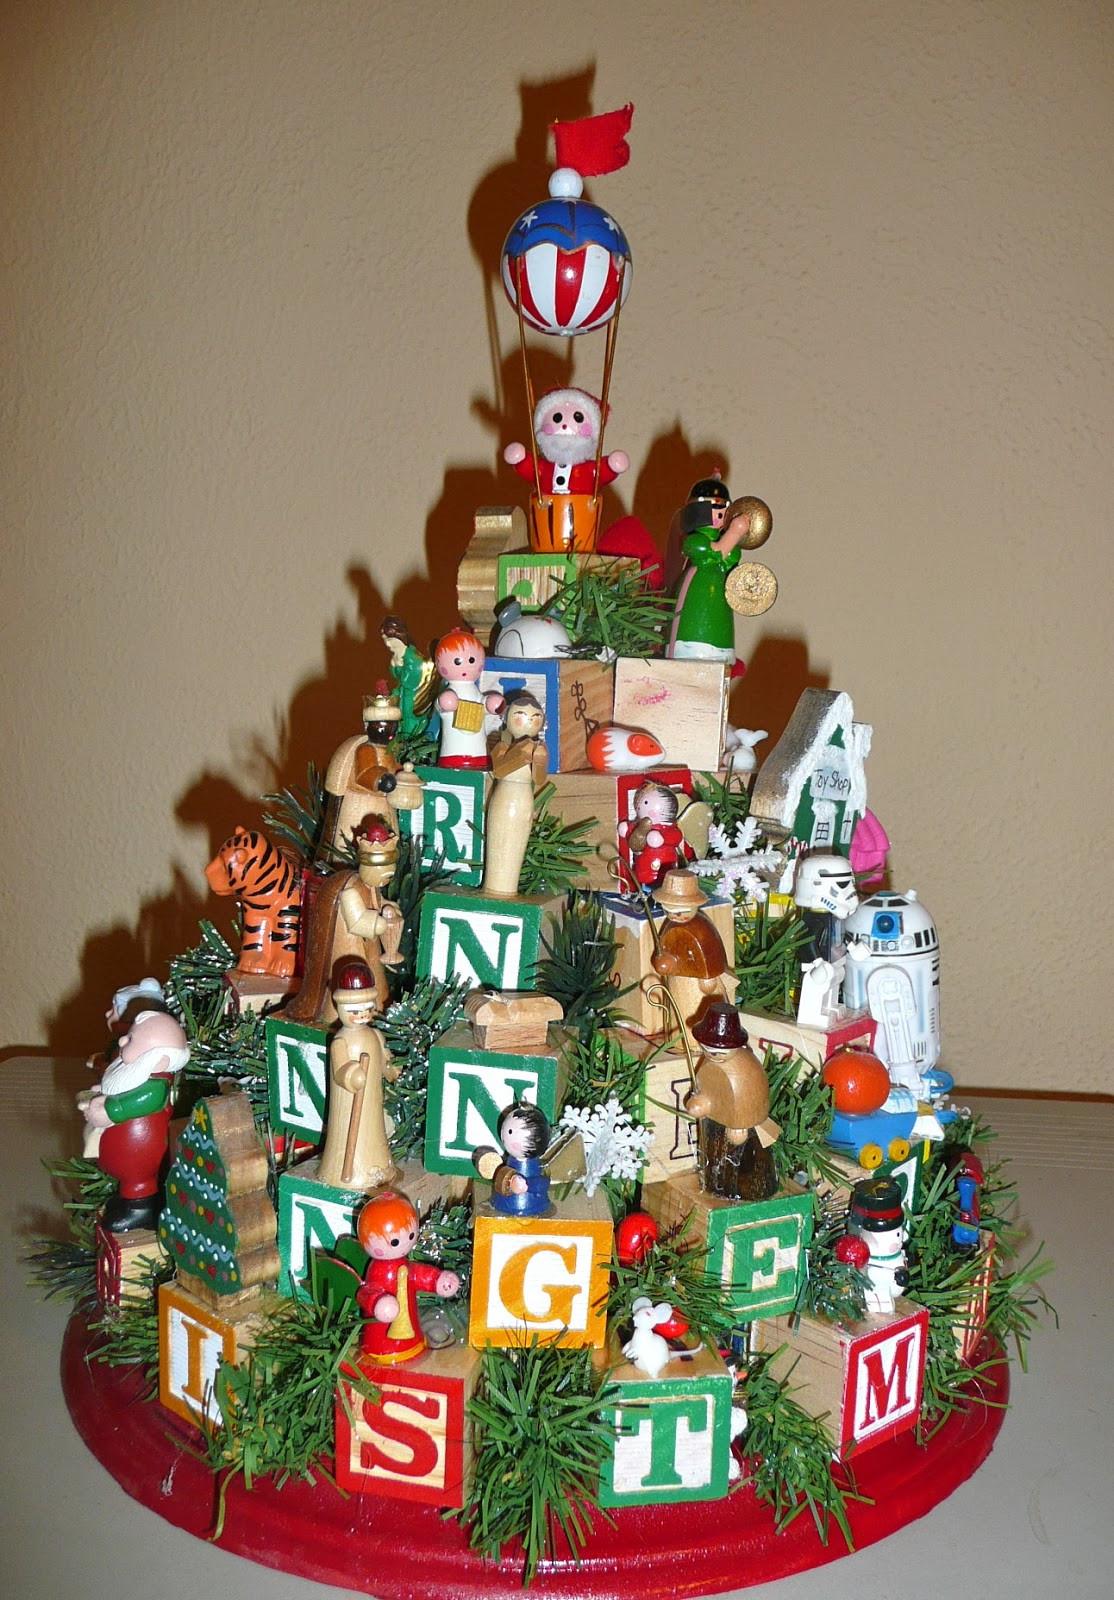 Christmas DIY Crafts  Home Where Story Begins Family Heirloom Children s Block